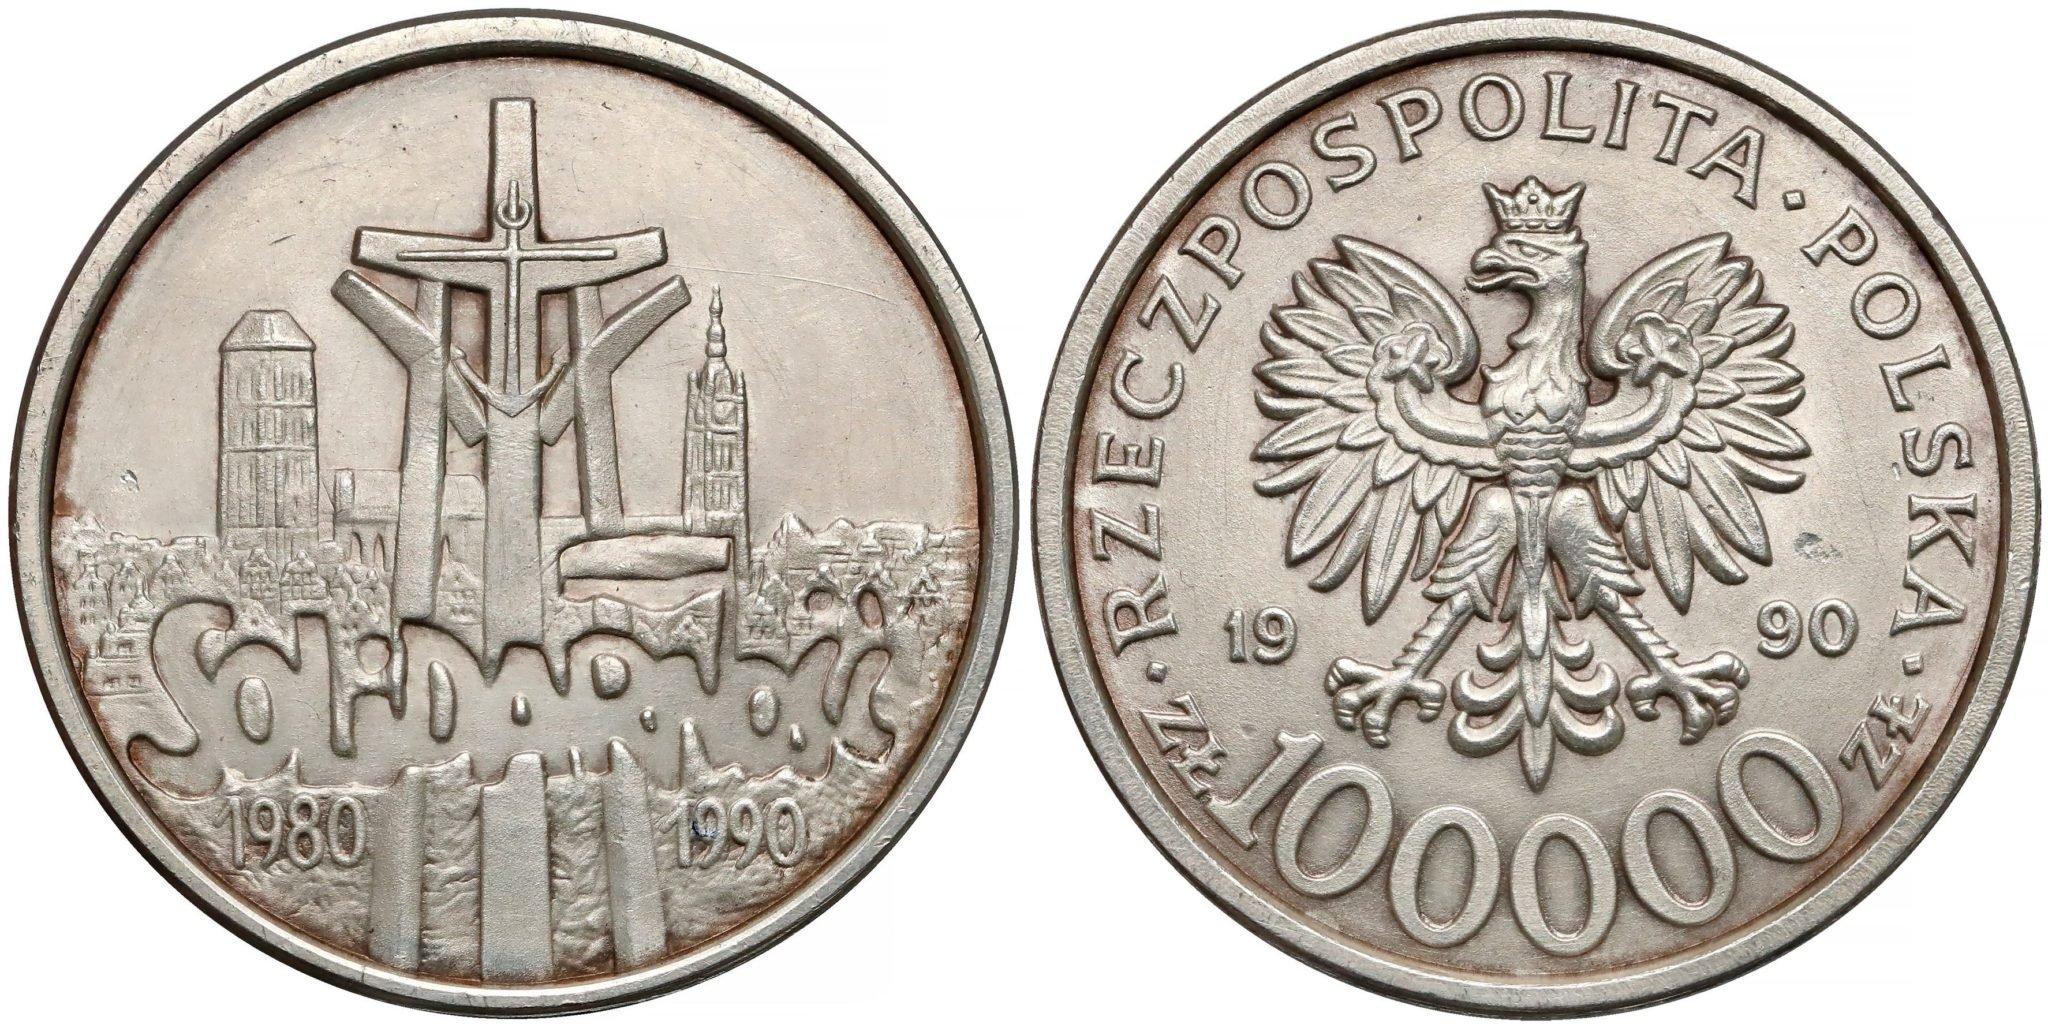 1990 Solidarnosc 100000 zl Typ B